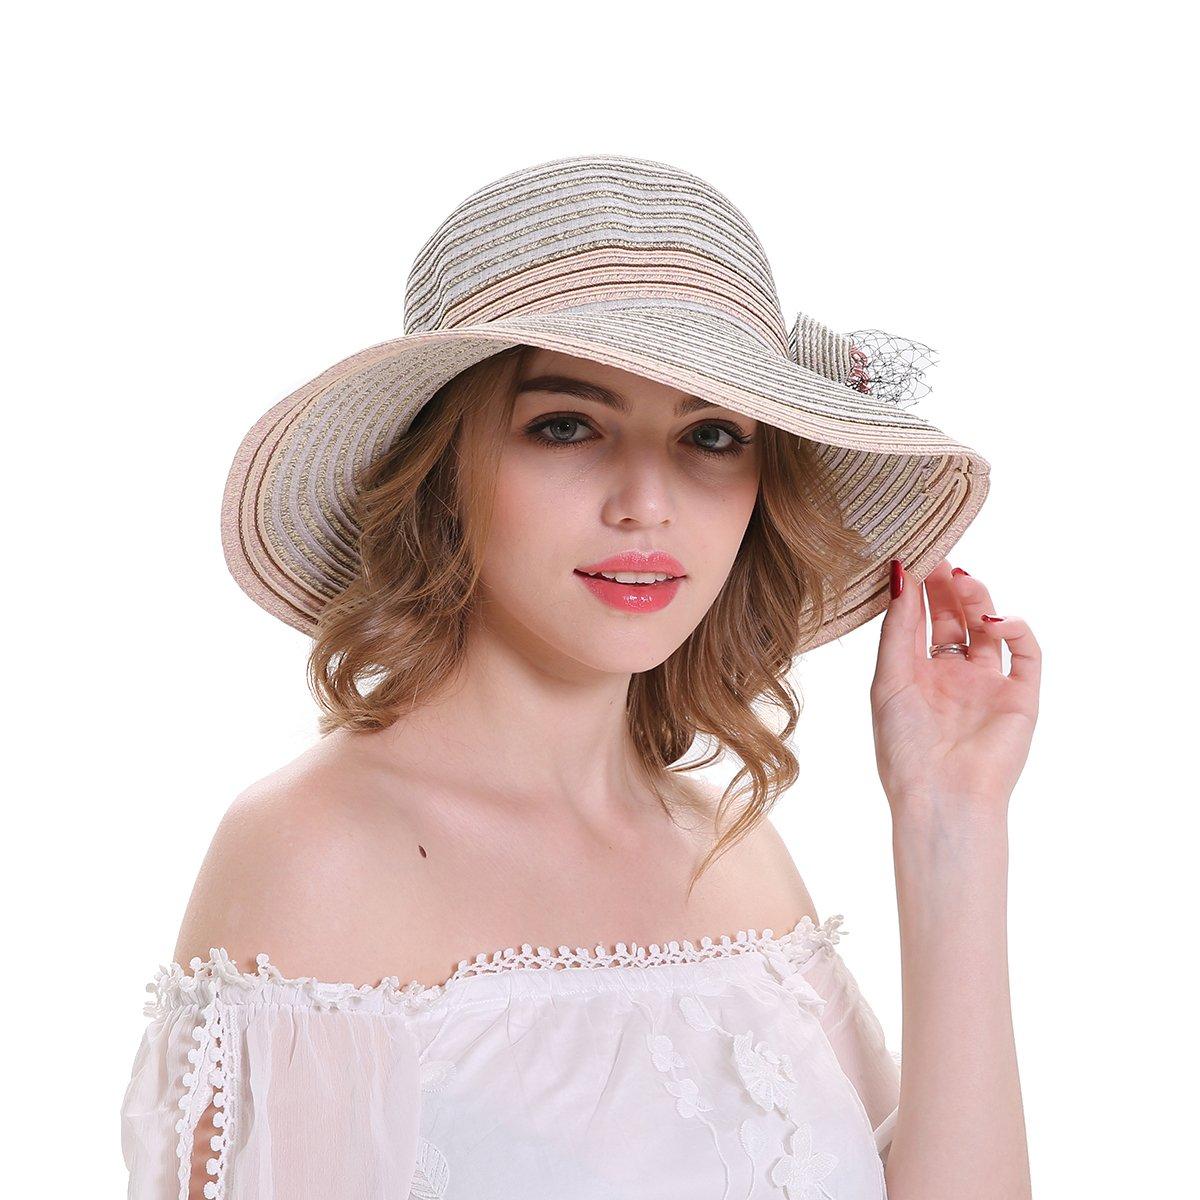 cbeb0d2e05857d MEEFUR Women's Adjustable Paper Straw Flower Beach Hat Church Cap Veil  Bowler Foldable Wide Brim Stripes Sun Hats Beige at Amazon Women's Clothing  store: